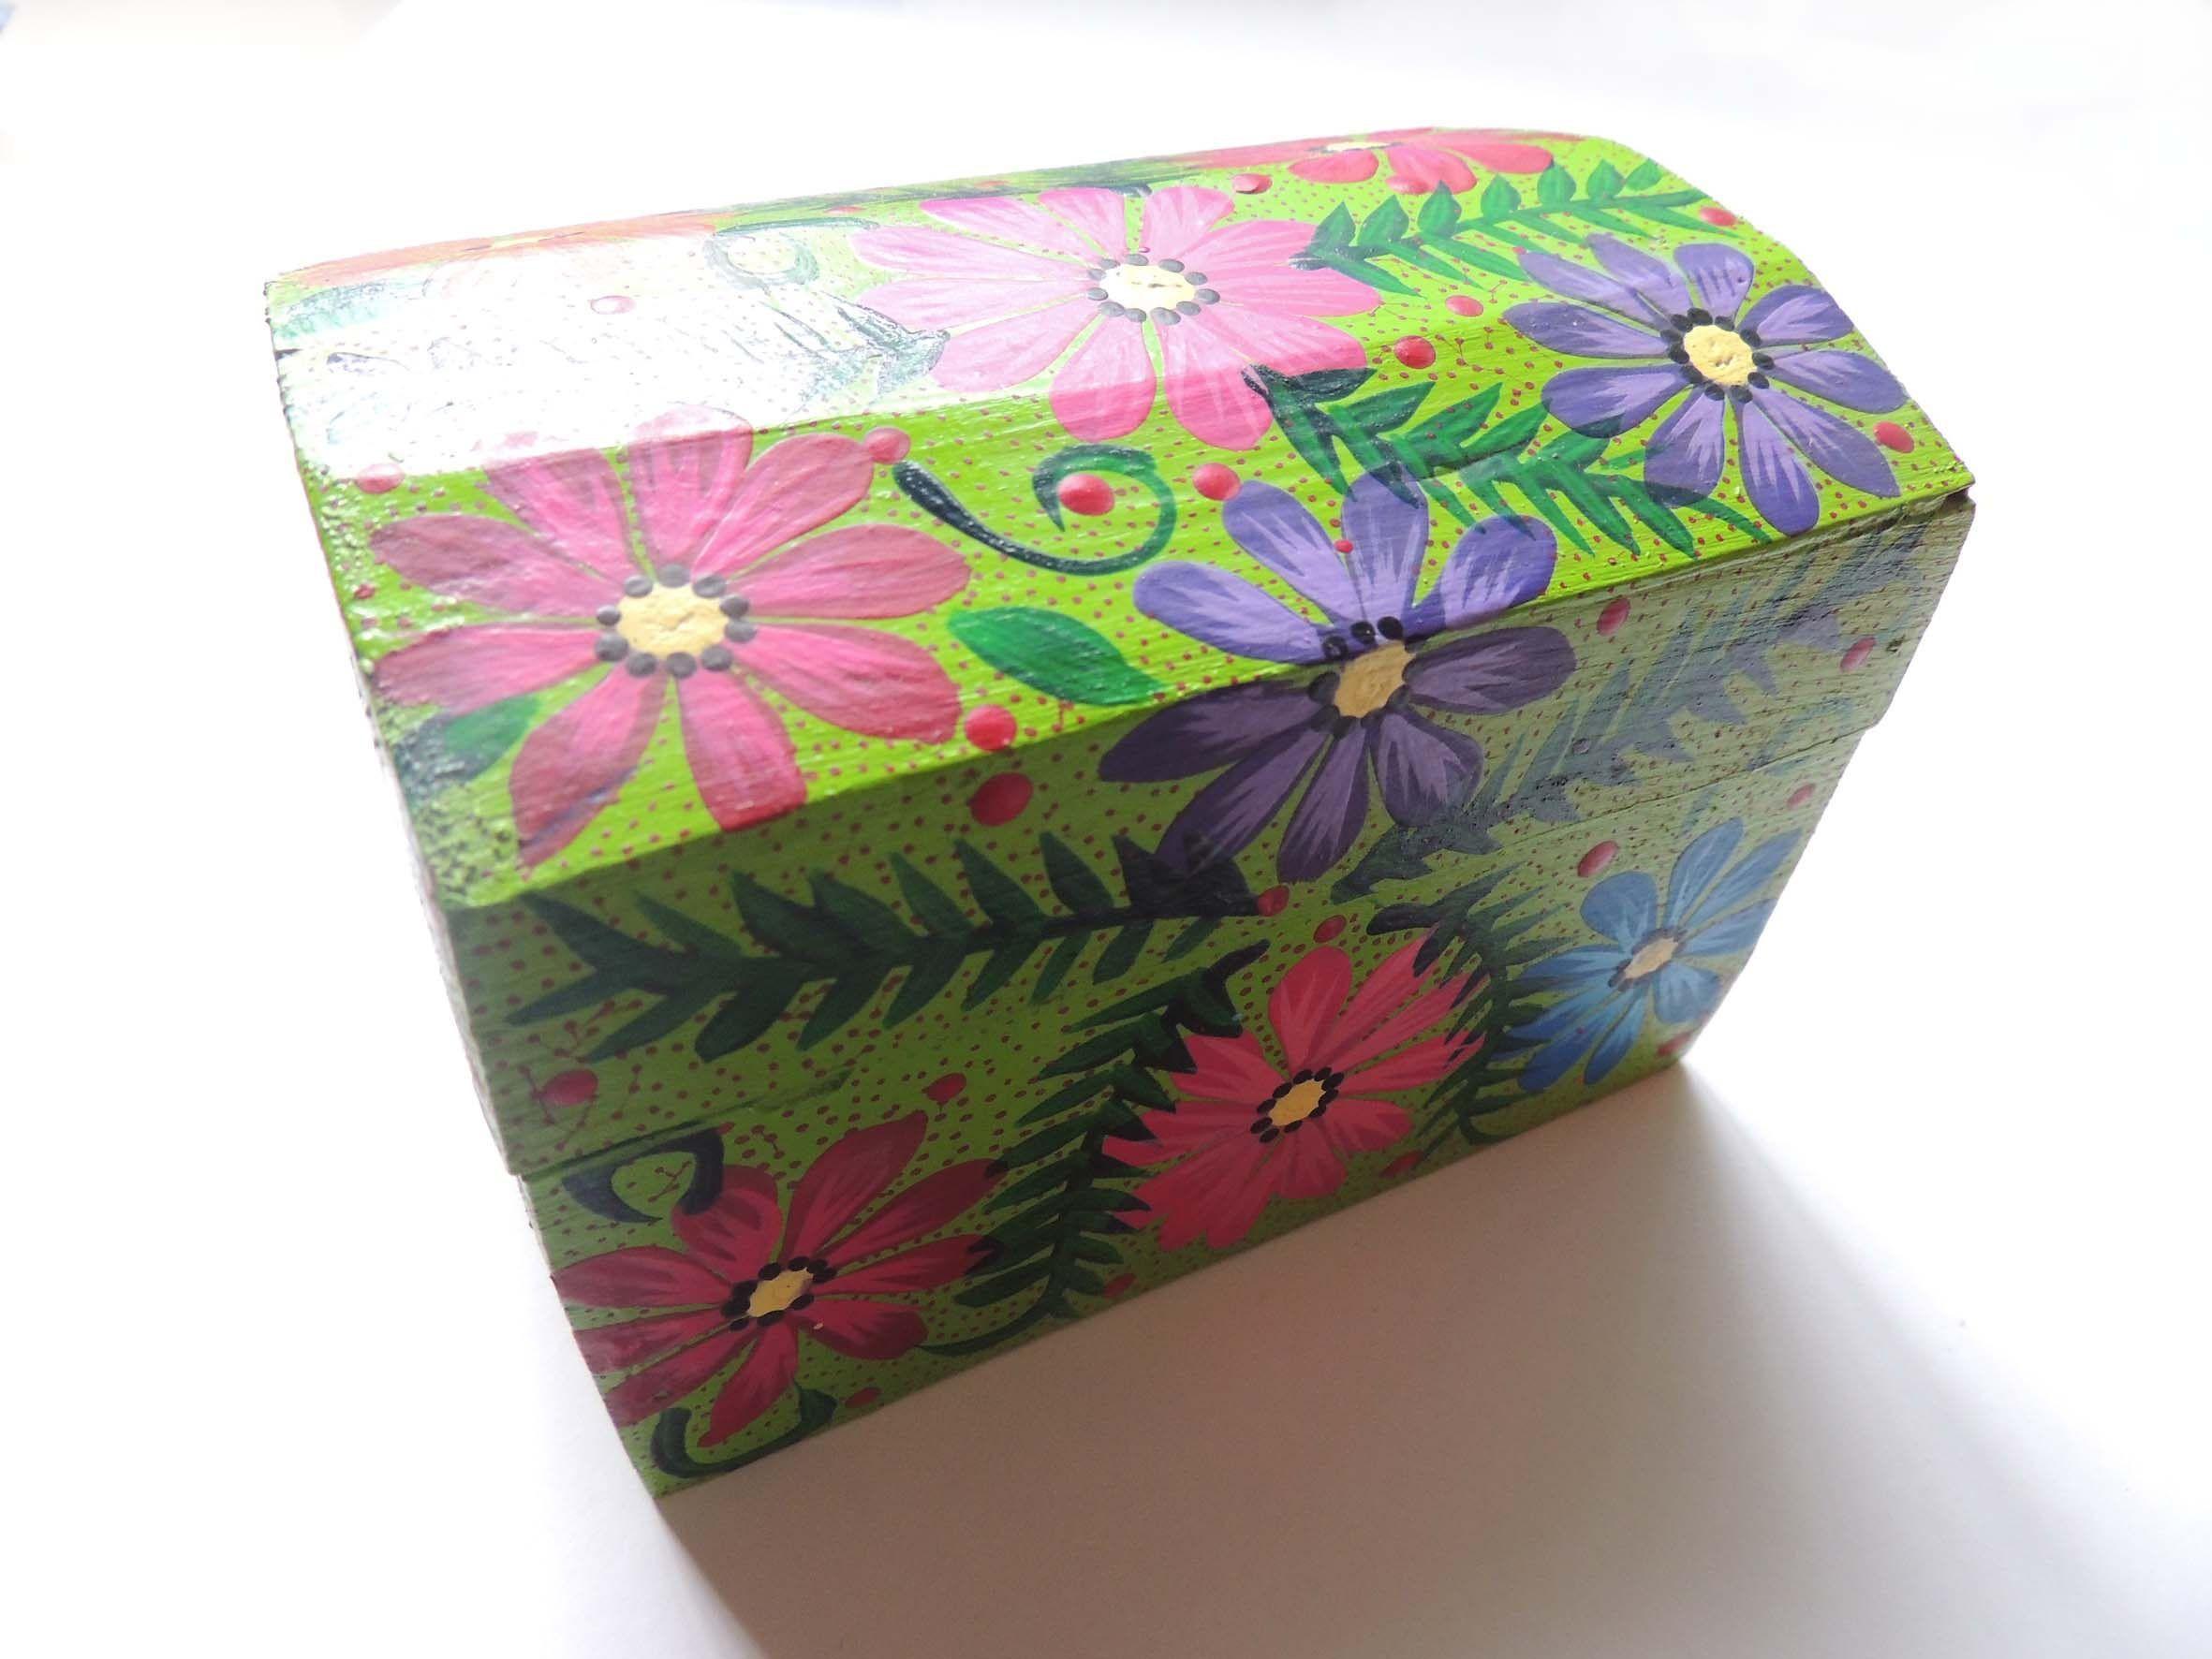 Un favorito personal de mi tienda de Etsy https://www.etsy.com/mx/listing/535084613/alebrije-jewelry-wooden-box-handmade-in